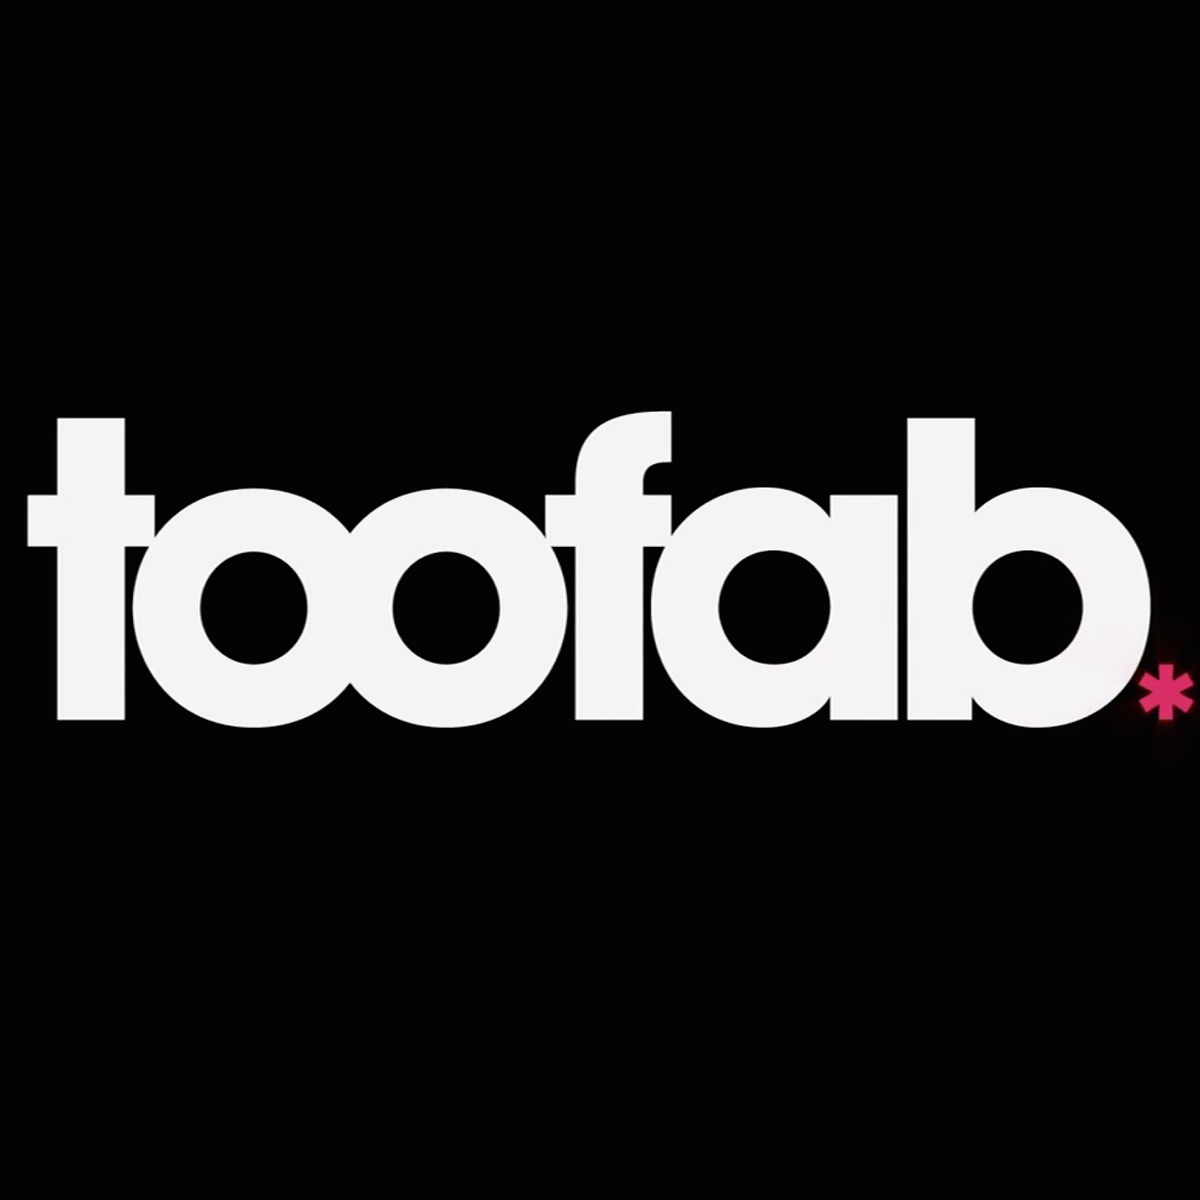 TooFab_2.jpg